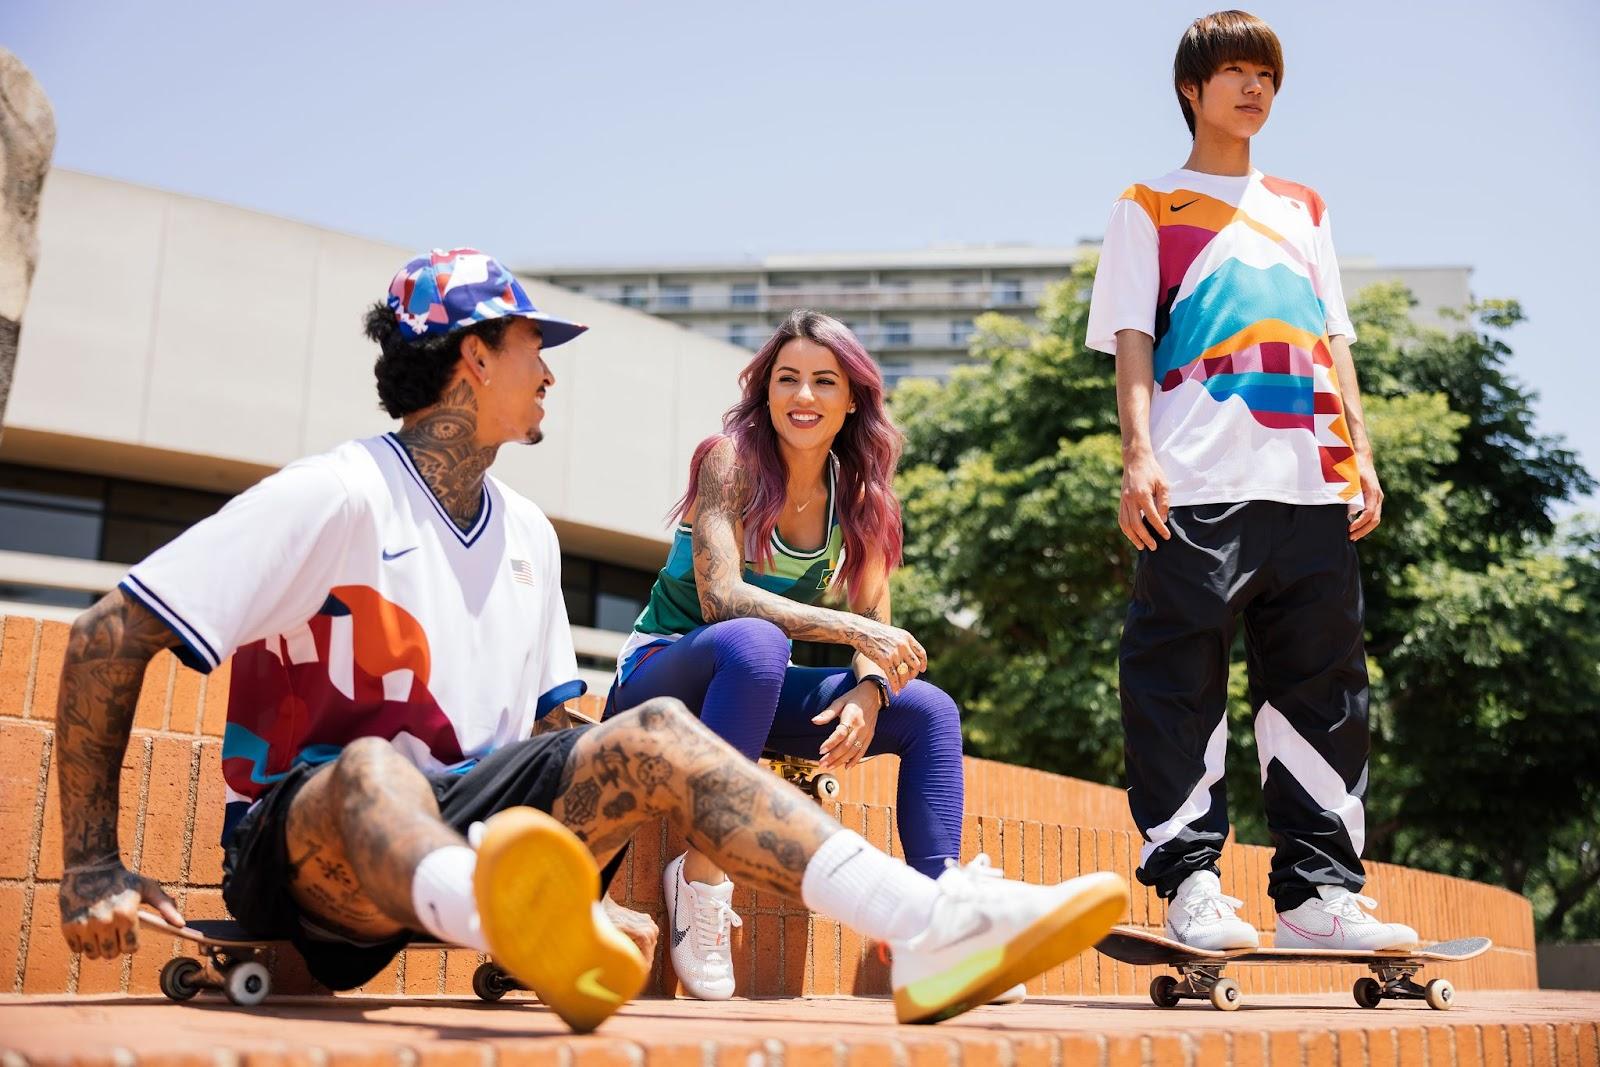 Skateboarding Olimpiadas